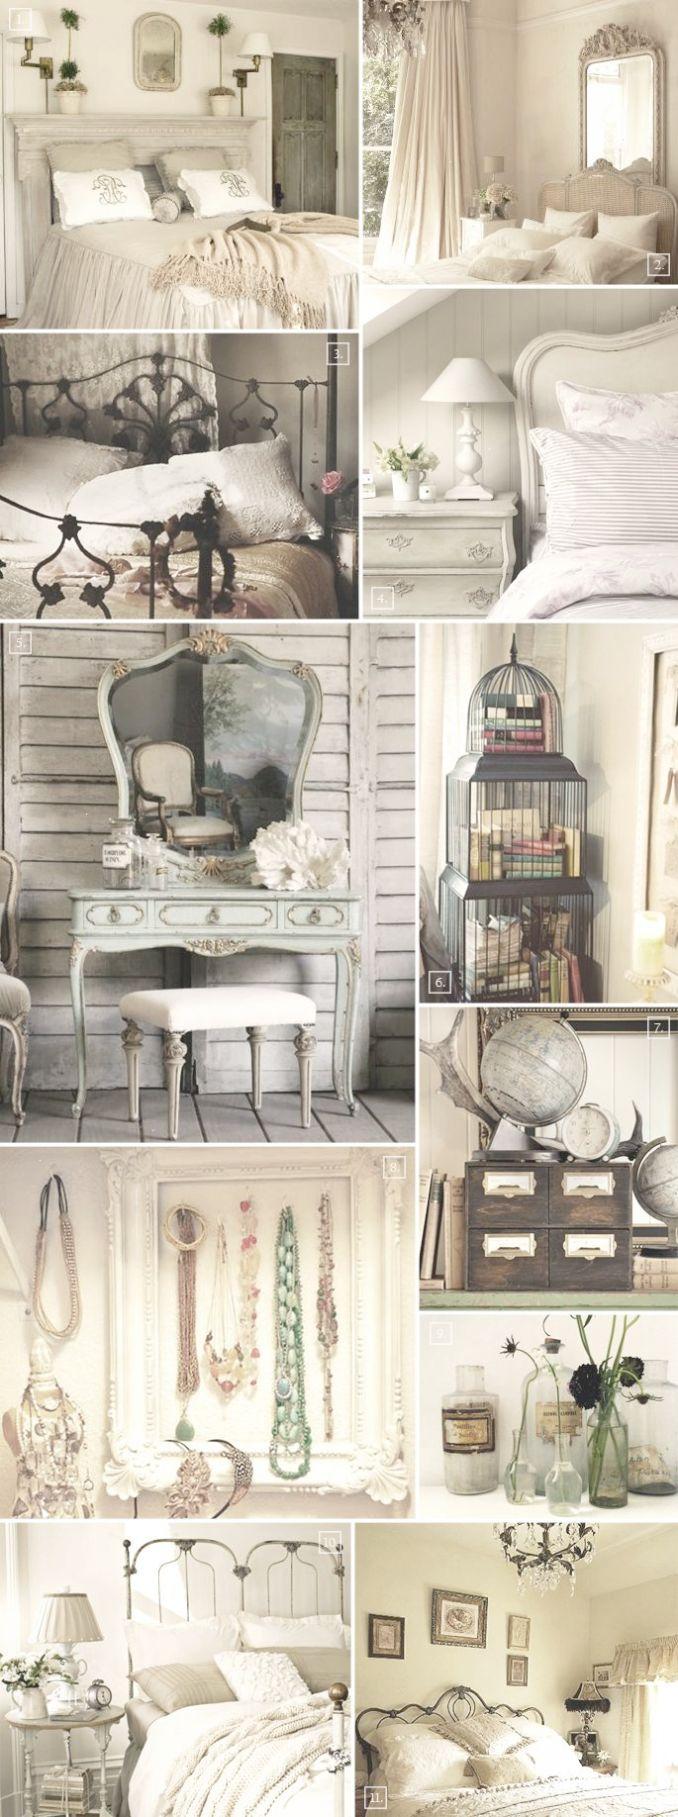 Interesting   Home Interior Design Software Free Online :D